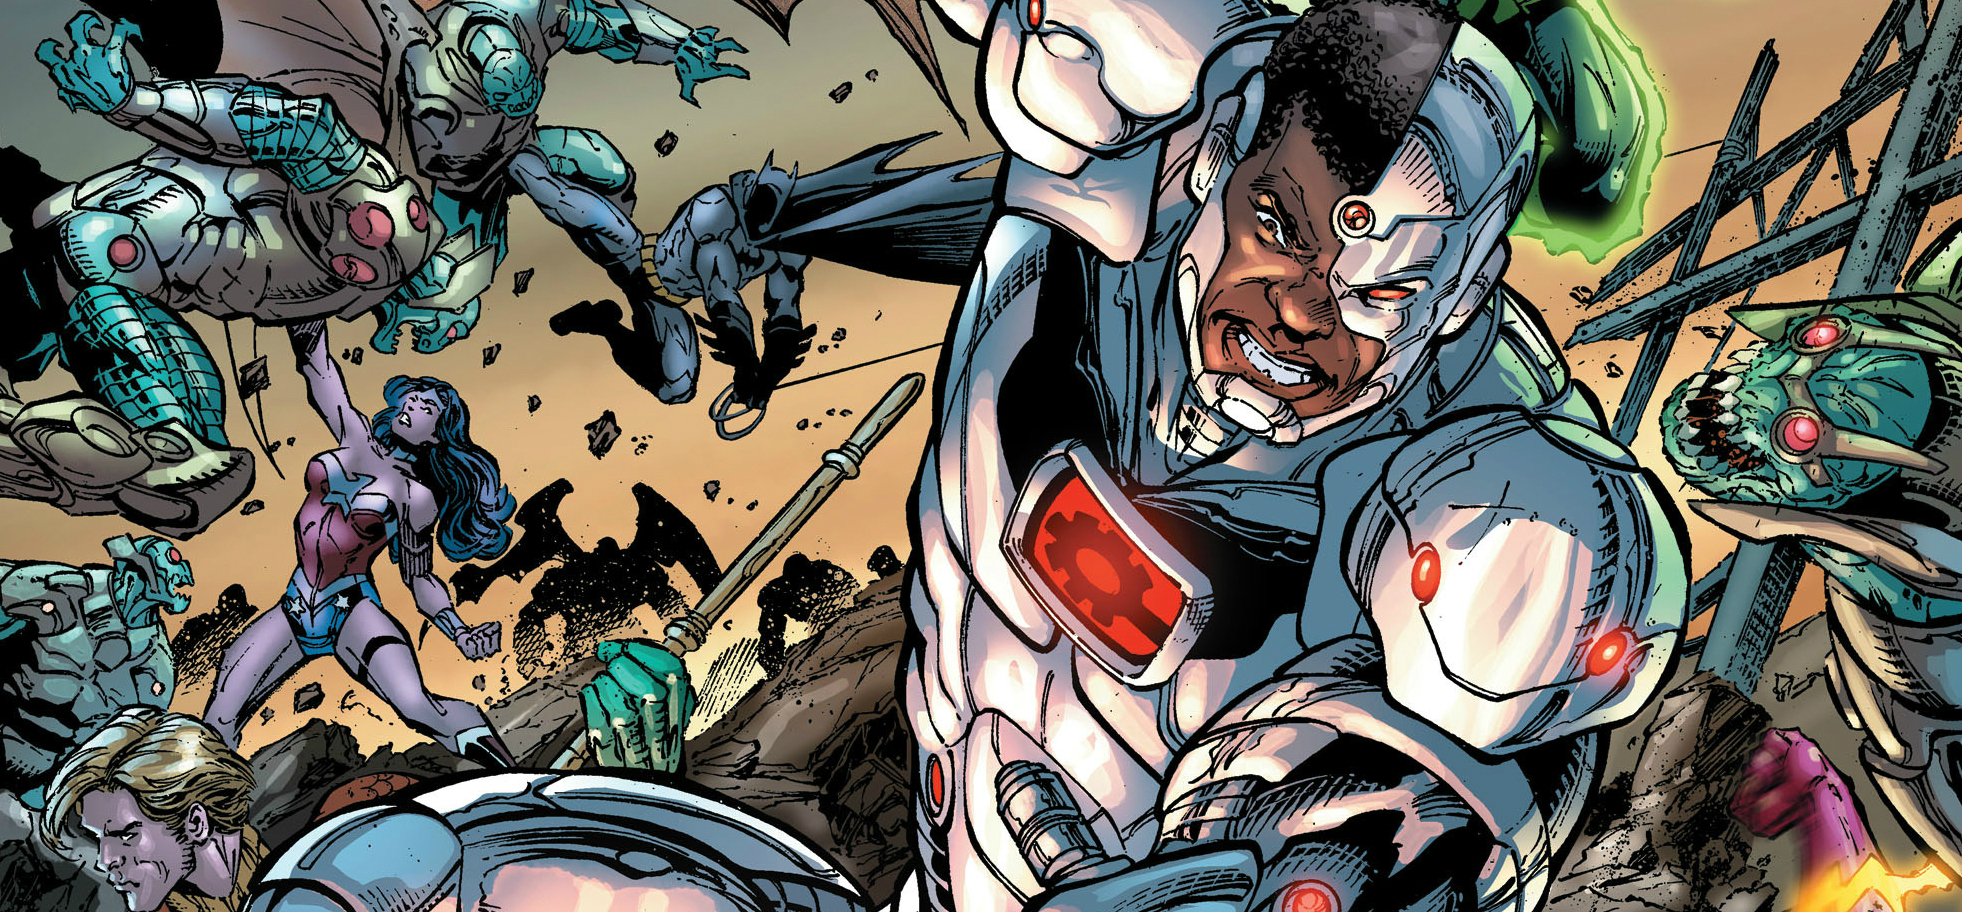 cyborg-rebirth-1-dc-comics-rebirth-46